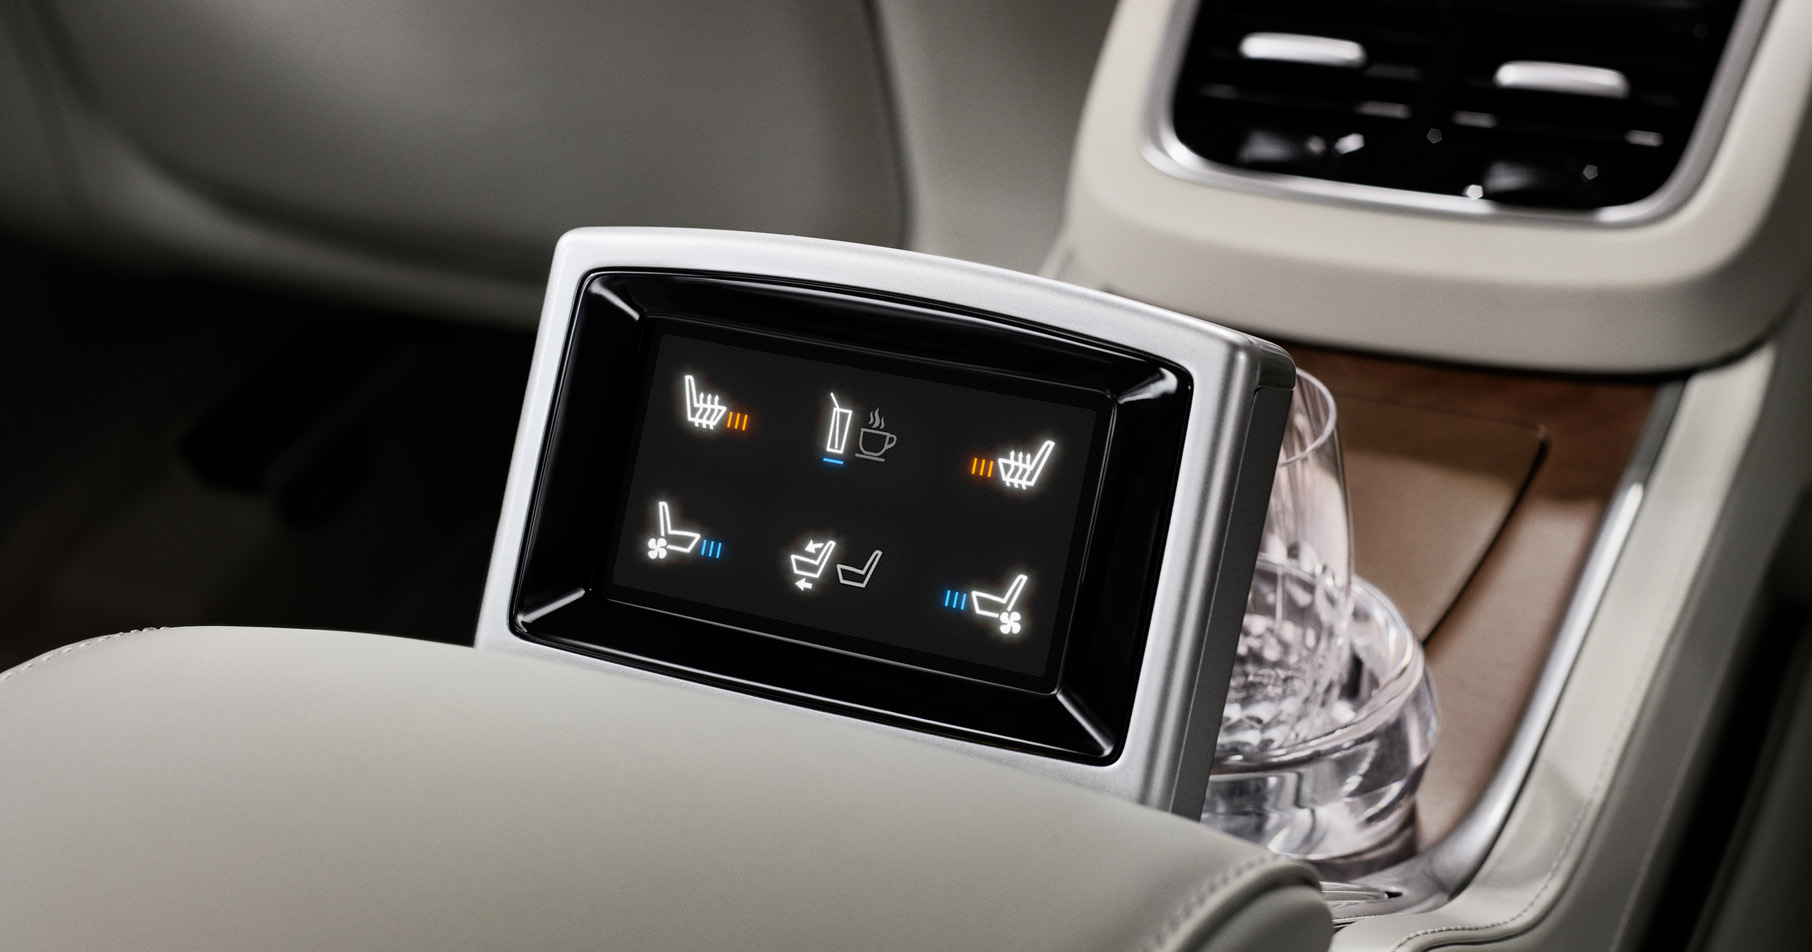 Volvo XC90 display